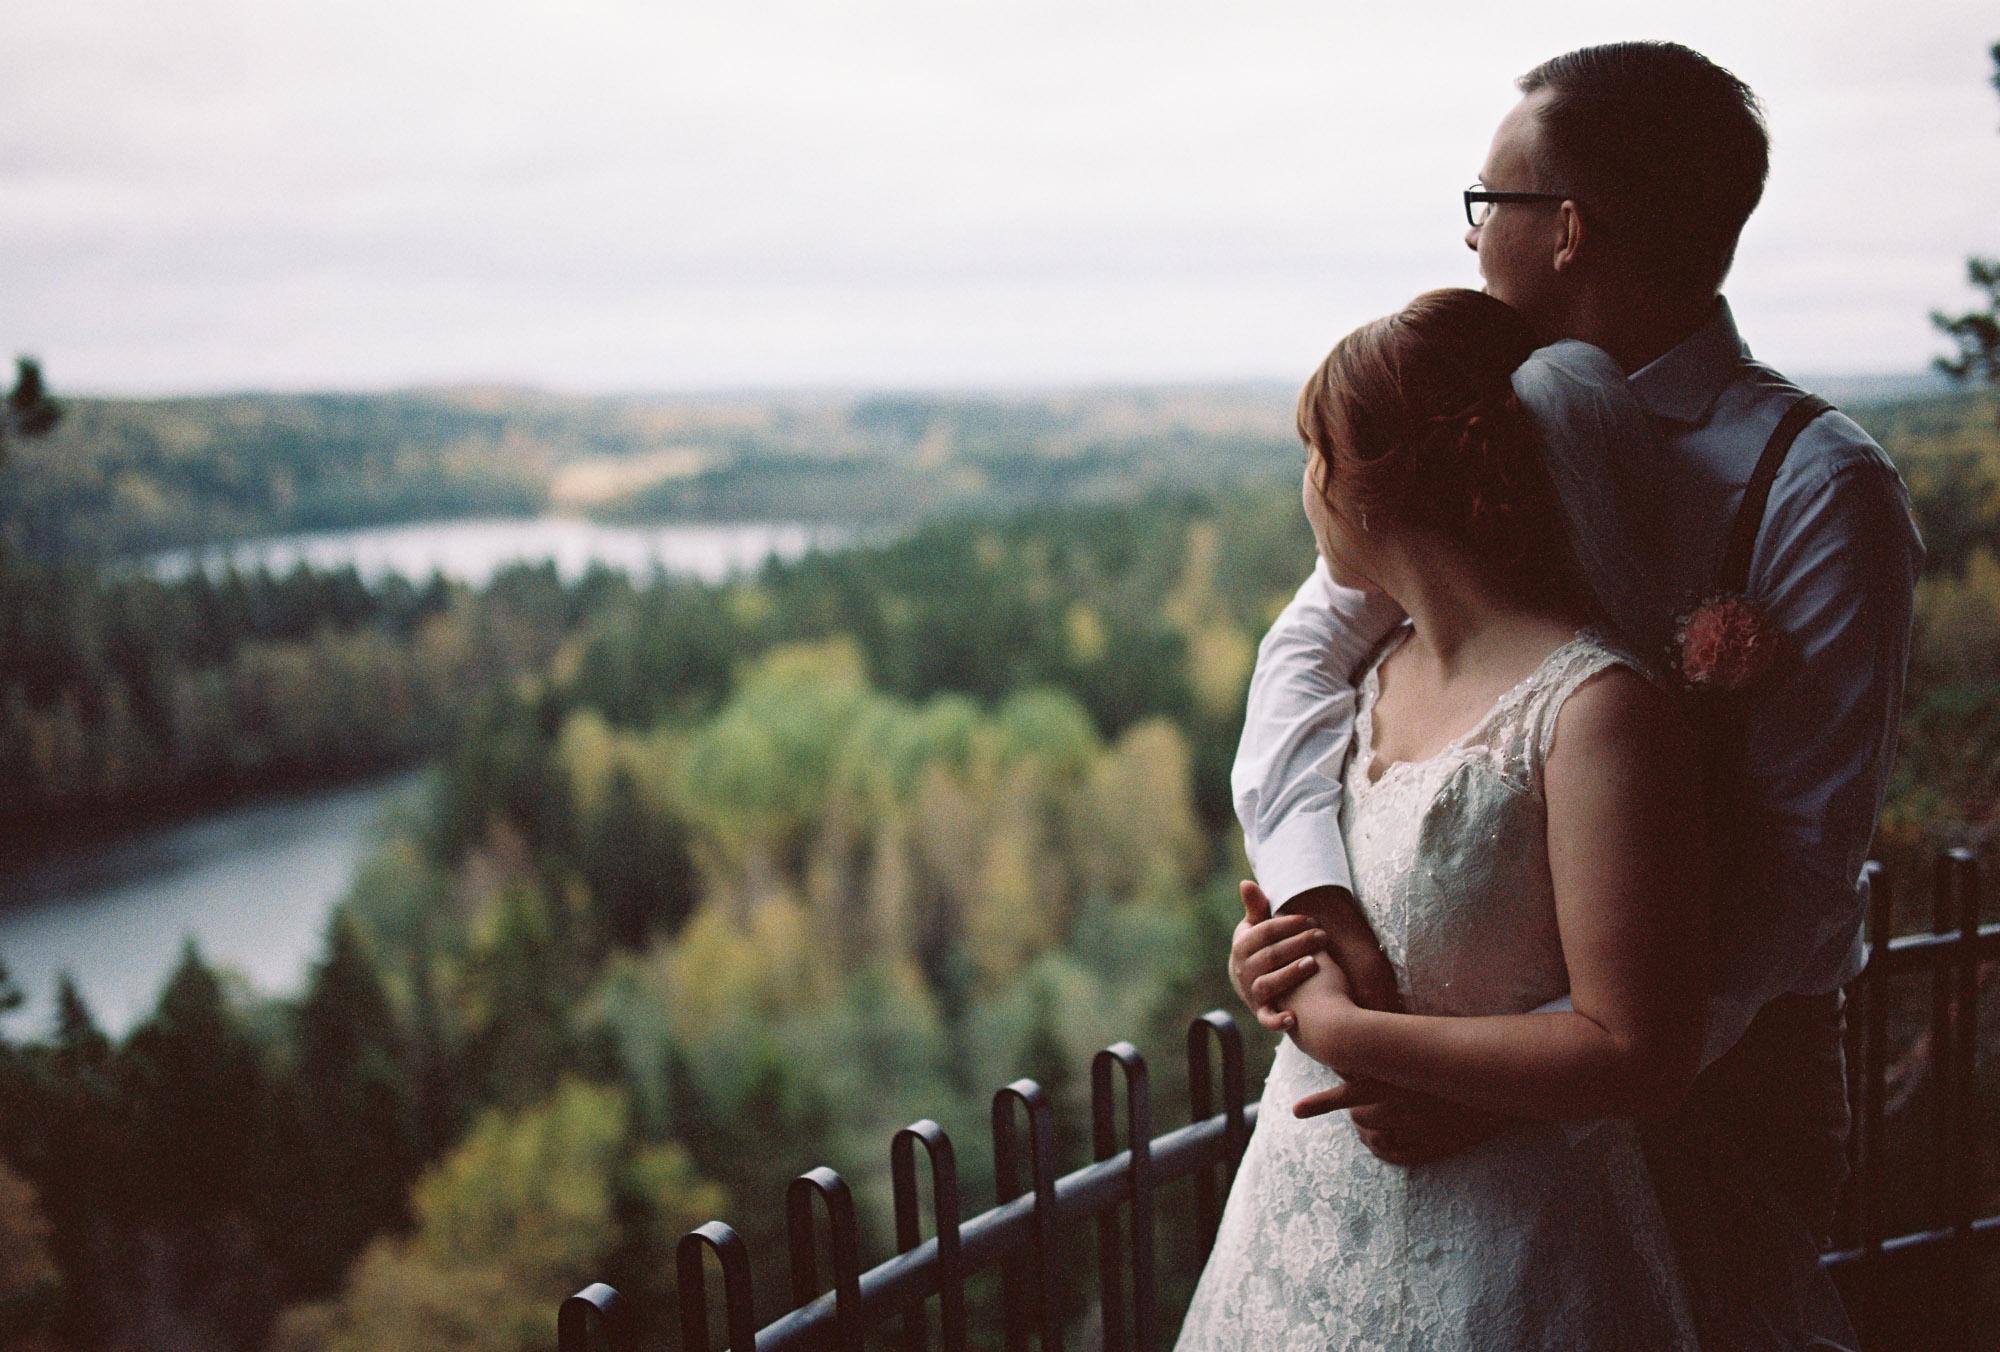 jere-satamo-analog-film-wedding-photographer-finland-132.jpg